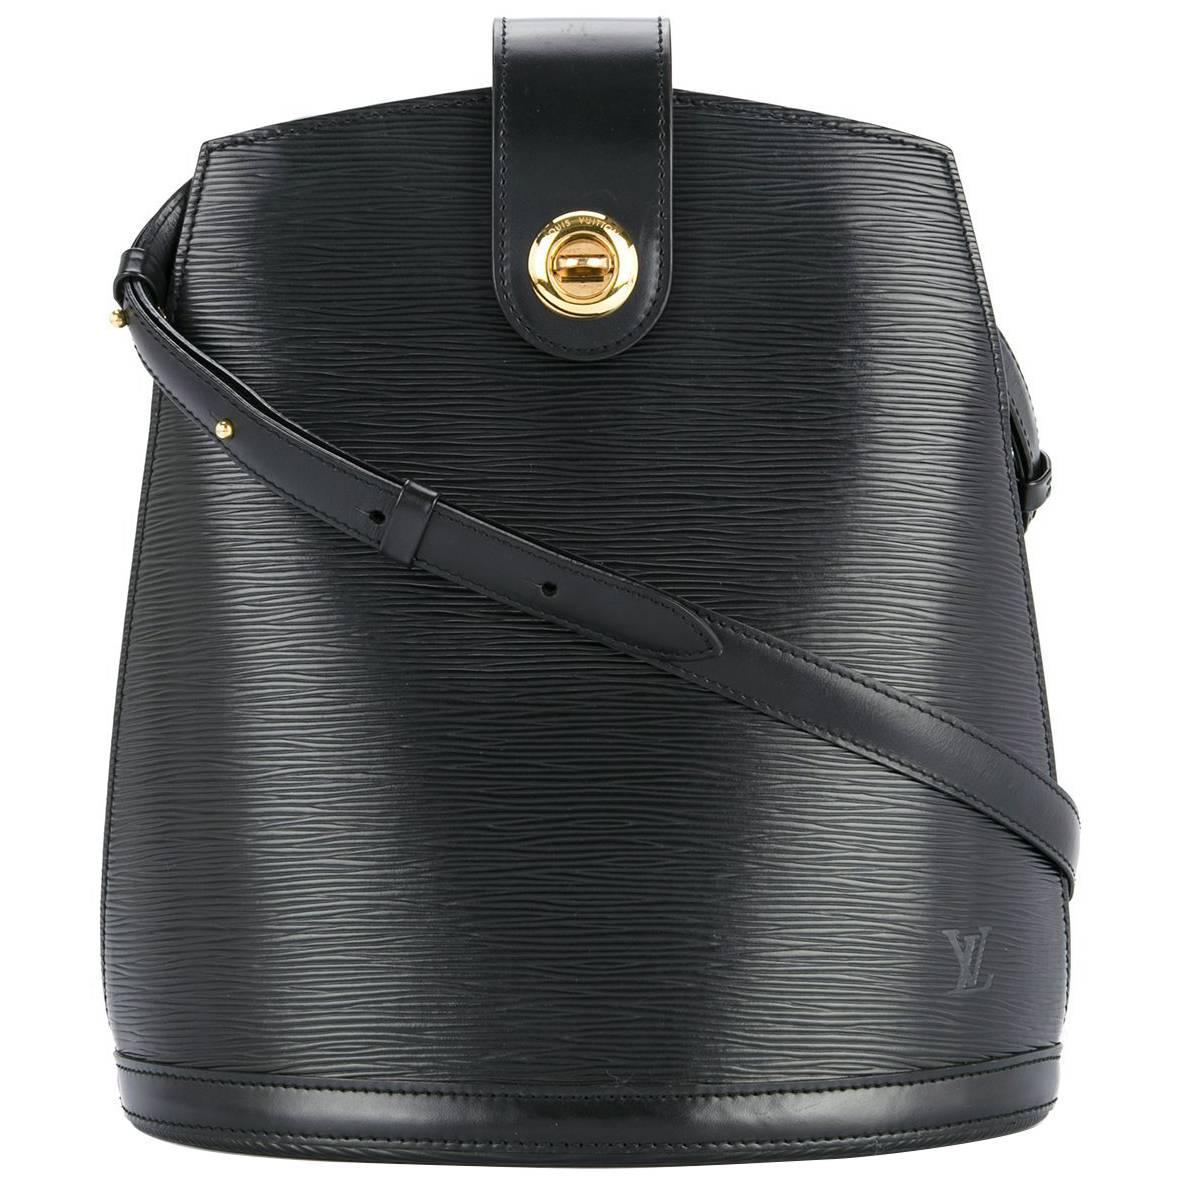 Louis Vuitton Leather Gold Bucket Carryall Evening Shoulder Bag